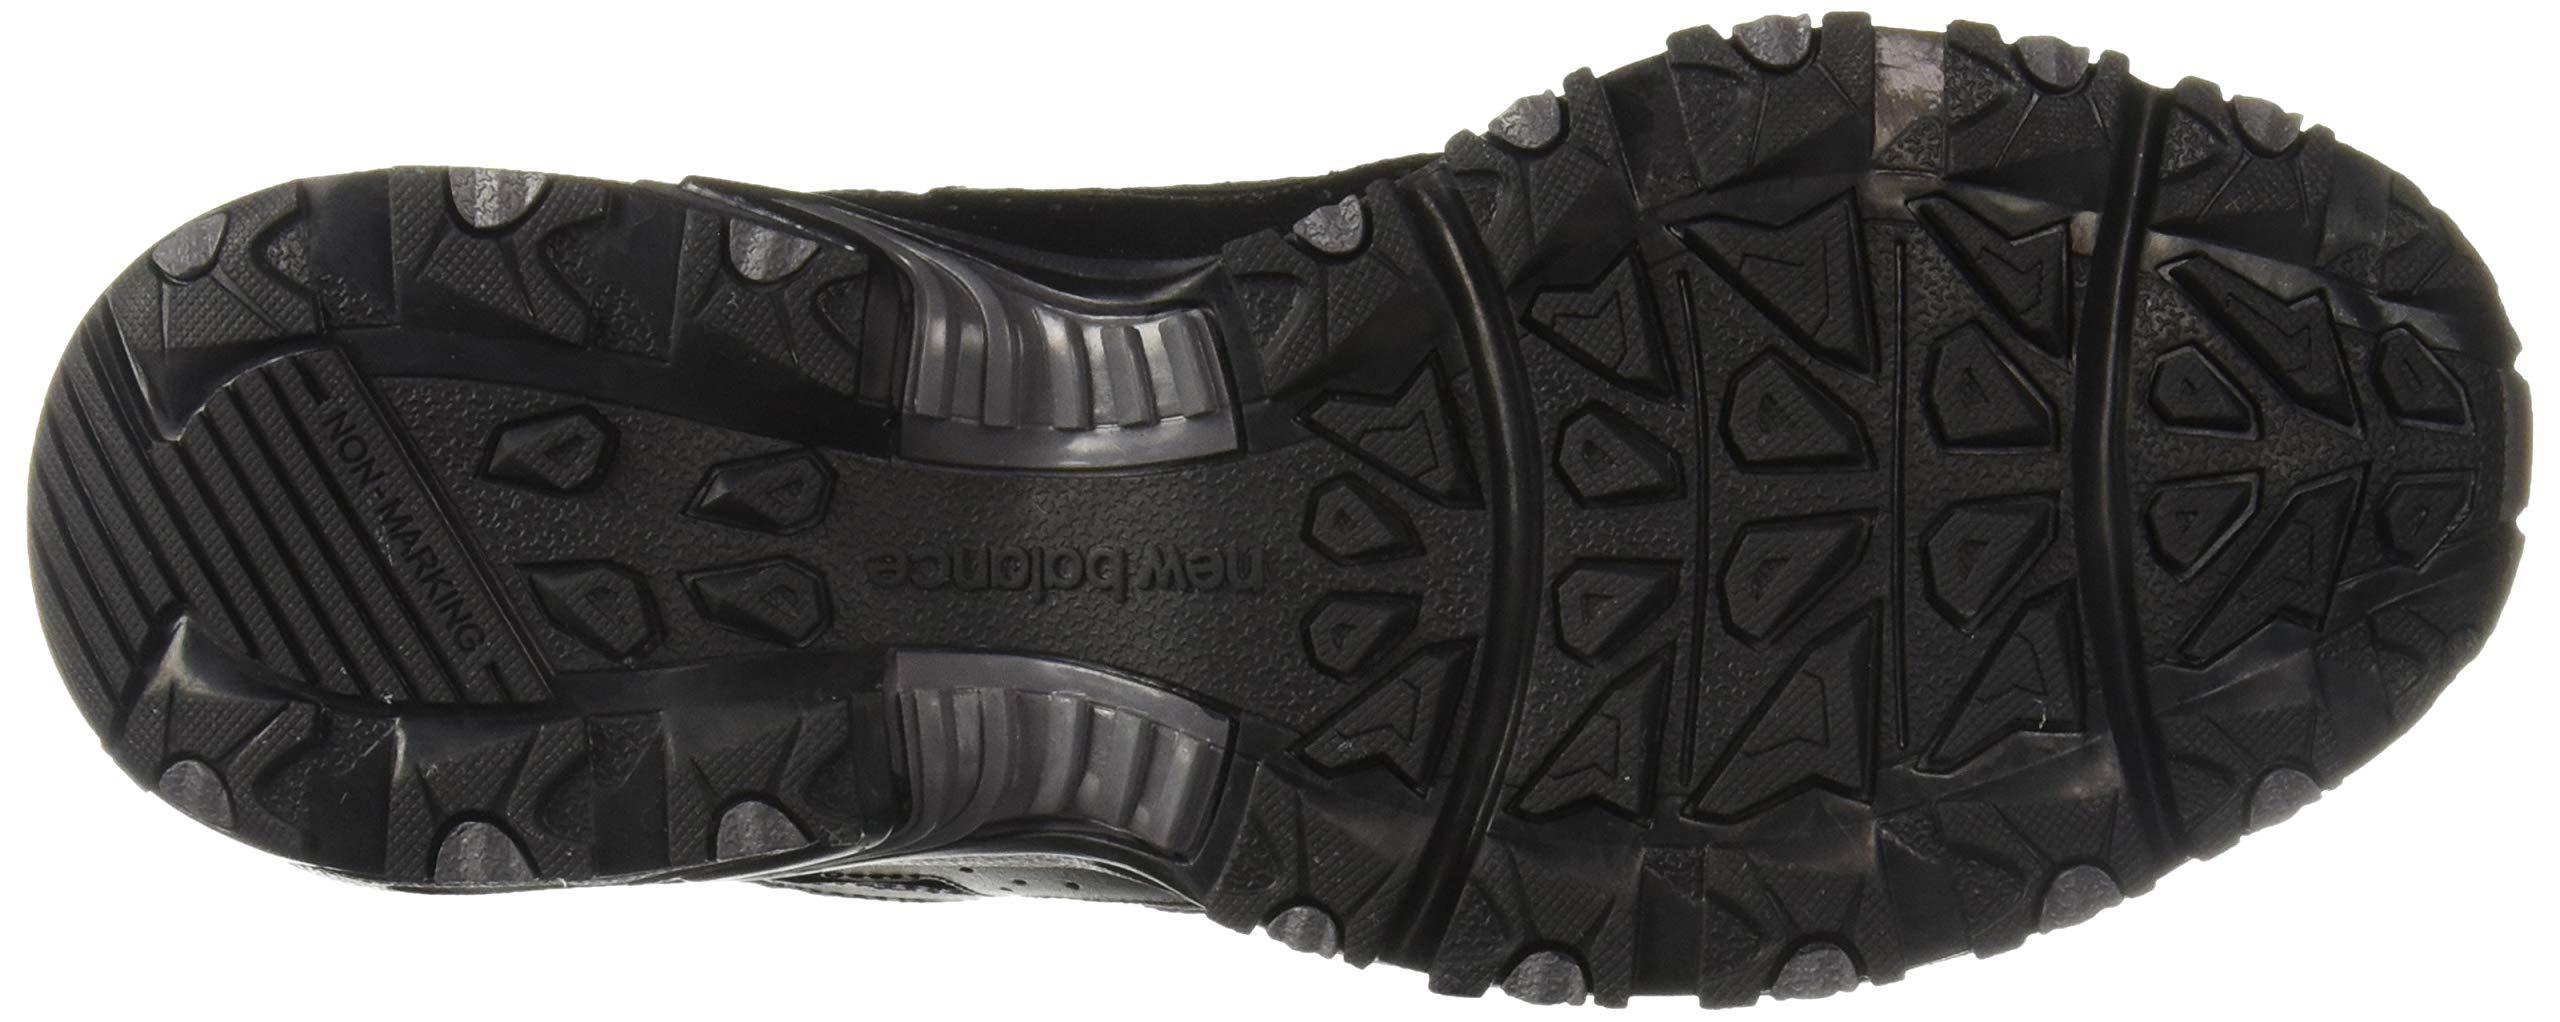 New Balance Men's 481 V3 Cushioning Trail Running Shoe Black/Magnet 9.5 D US by New Balance (Image #3)